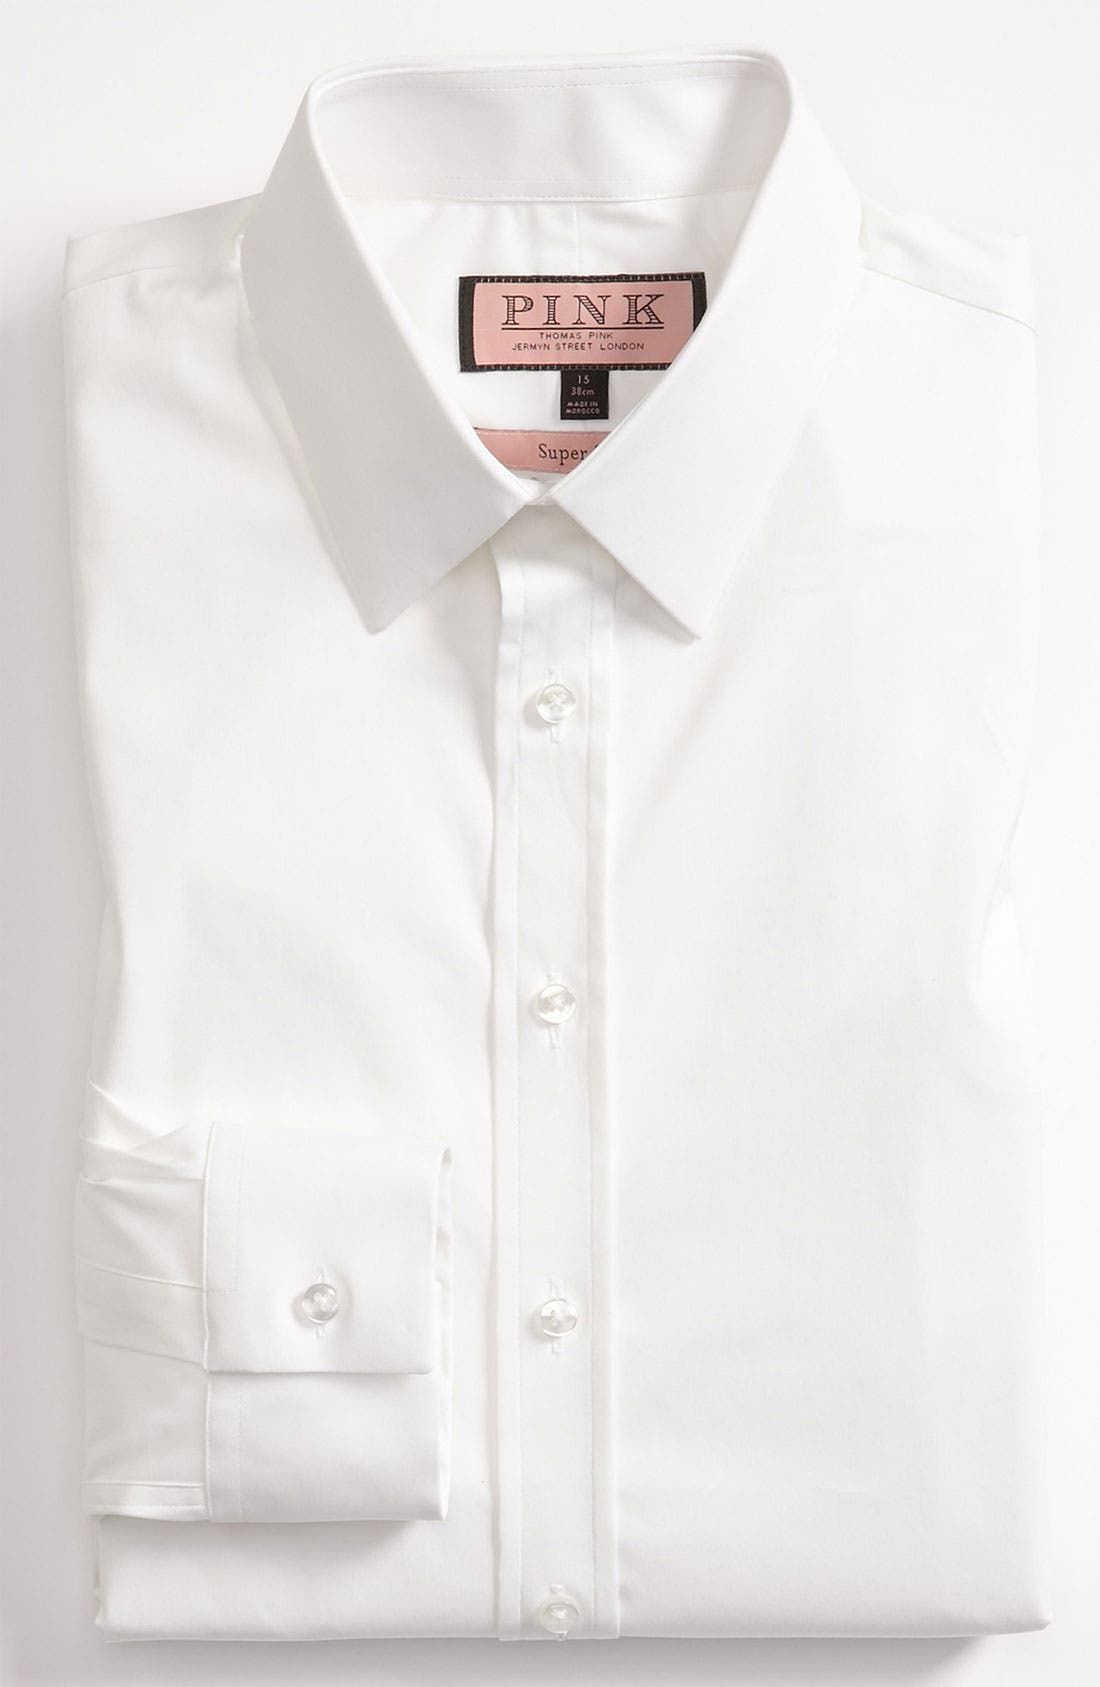 Alternate Image 1 Selected - Thomas Pink Super Slim Fit Dress Shirt